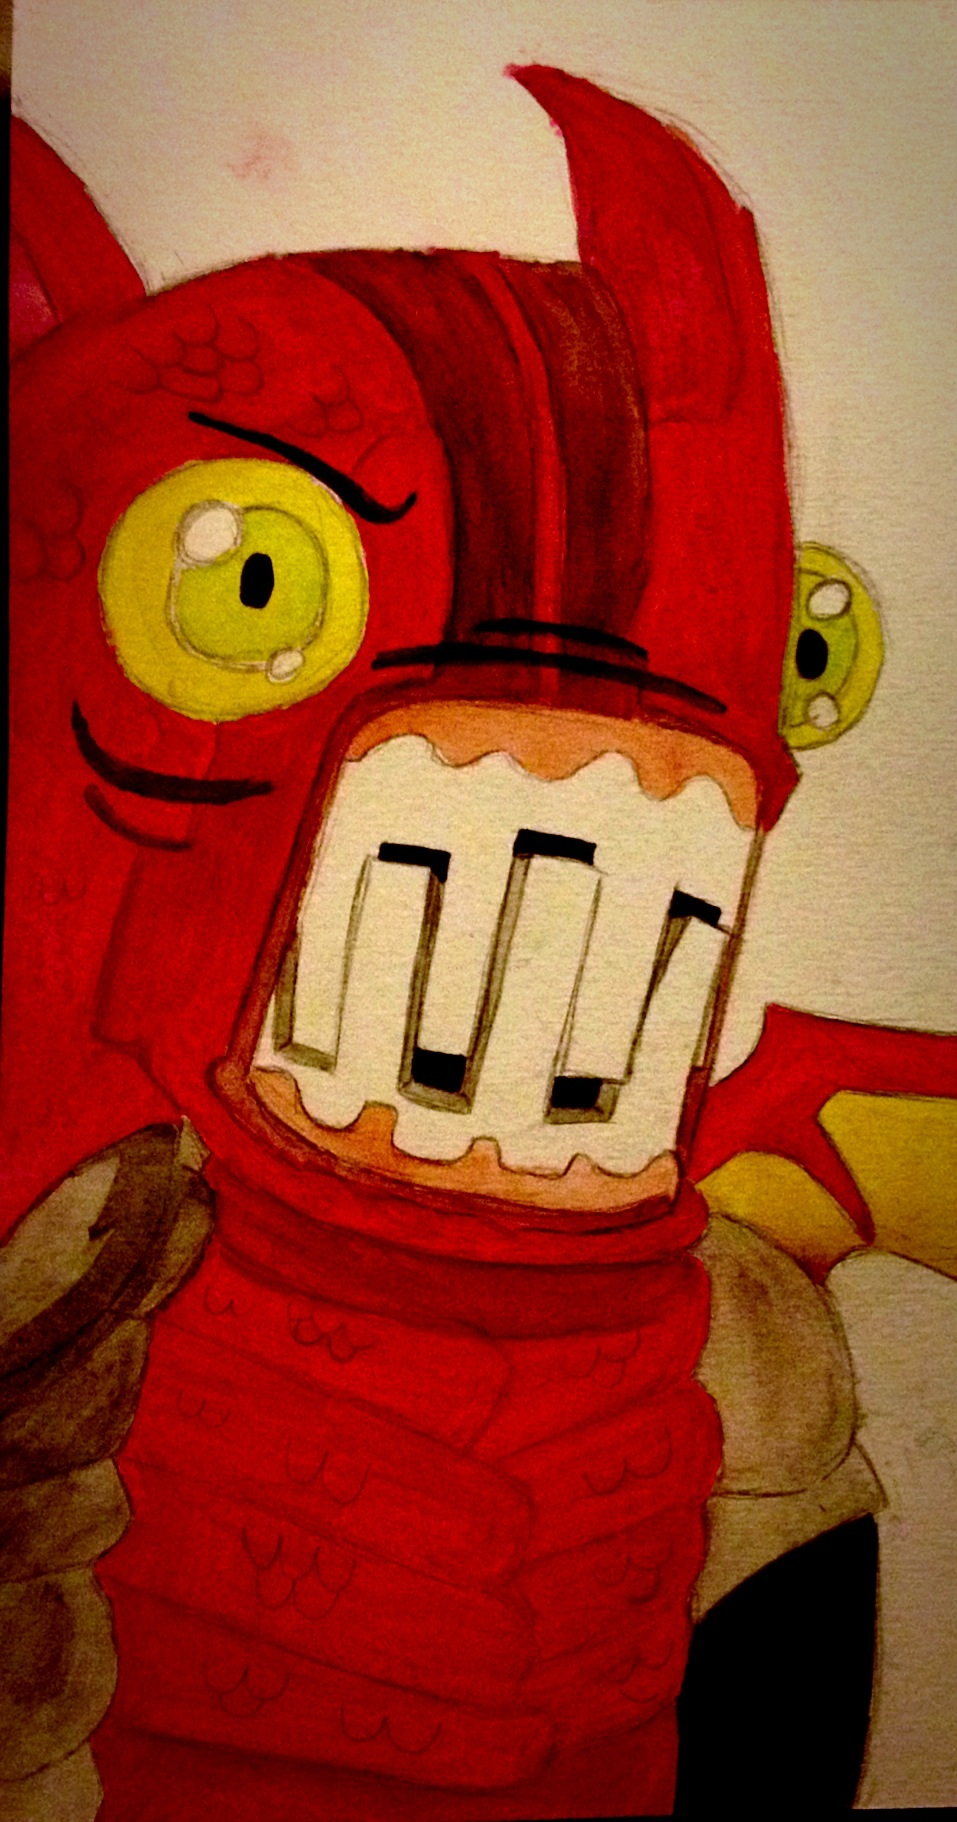 Castle crashers fire demon by rg418 on deviantart - Castle crashers anime ...